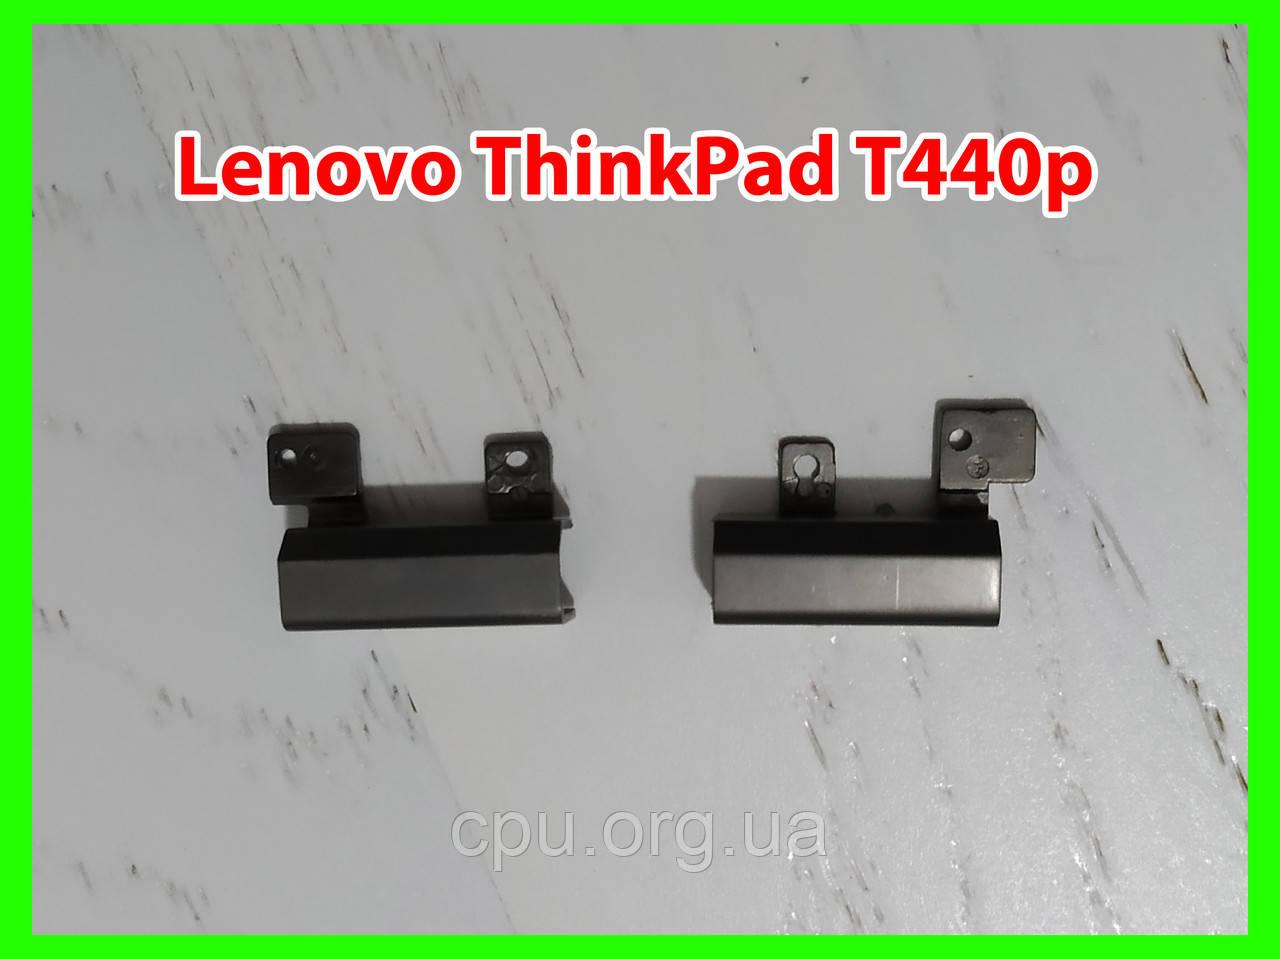 Накладки петель hinge cover Lenovo ThinkPad T440p